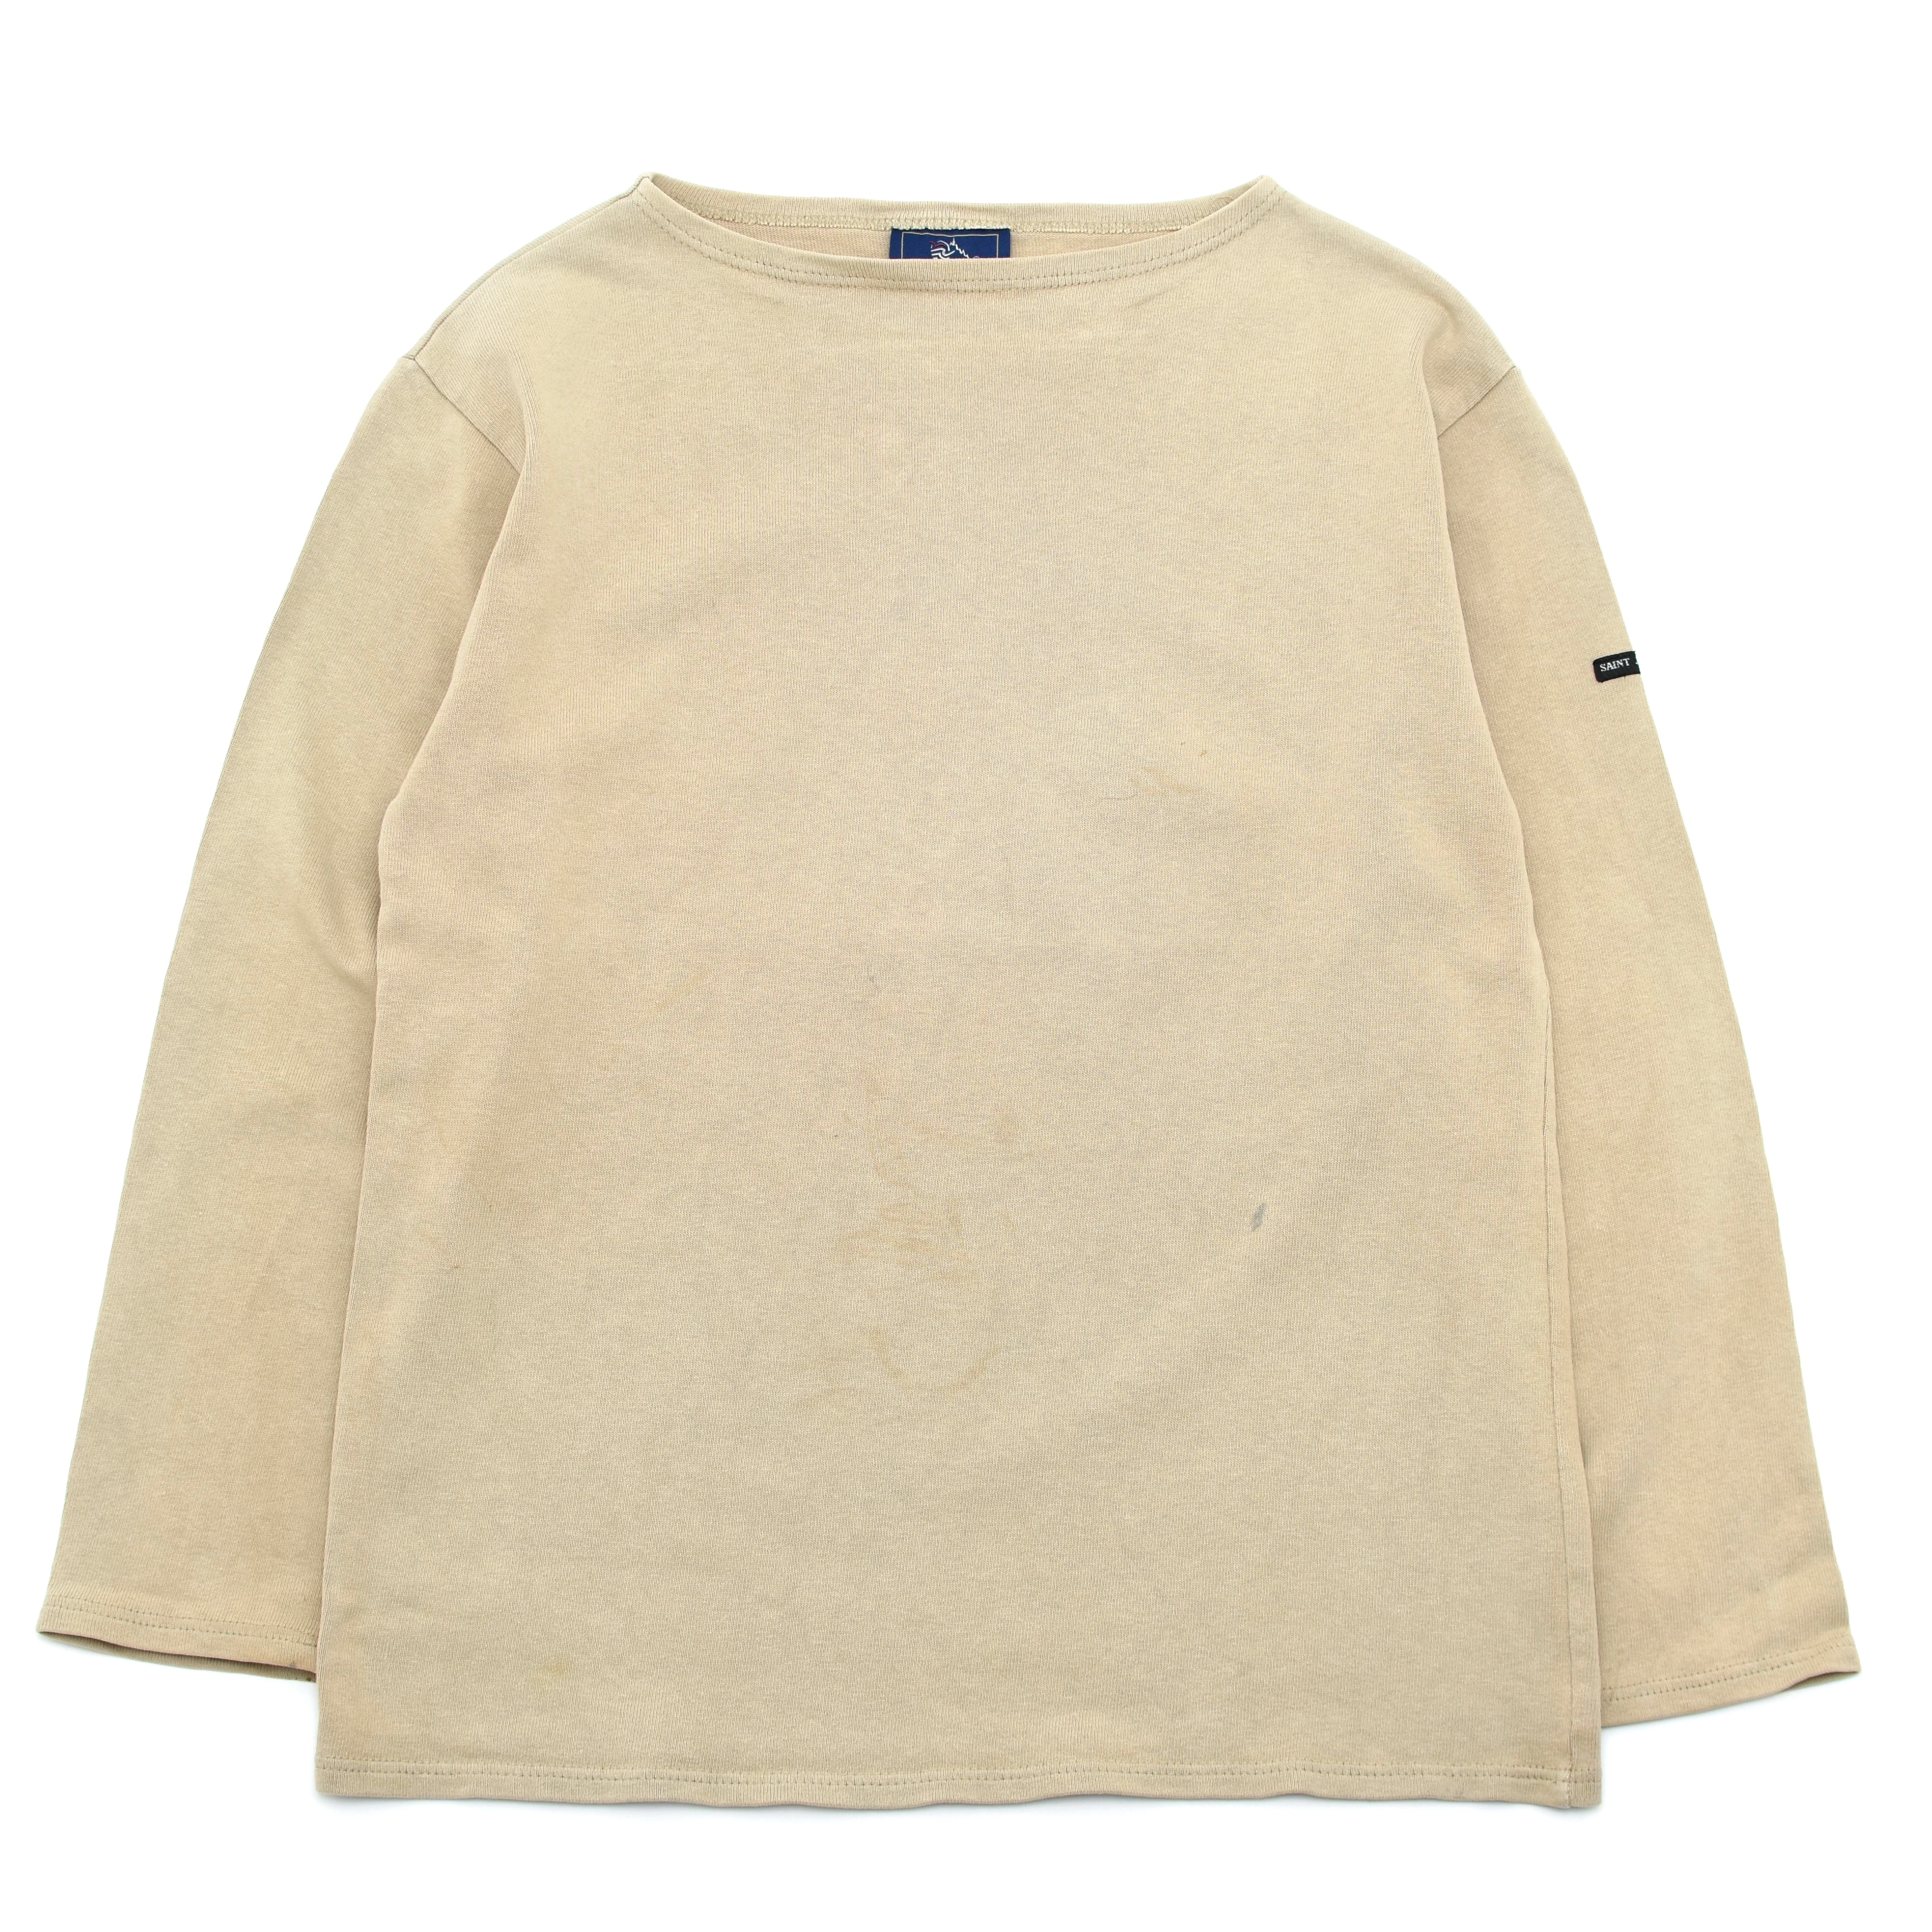 SAINT JAMES bretagne shirt Made in France